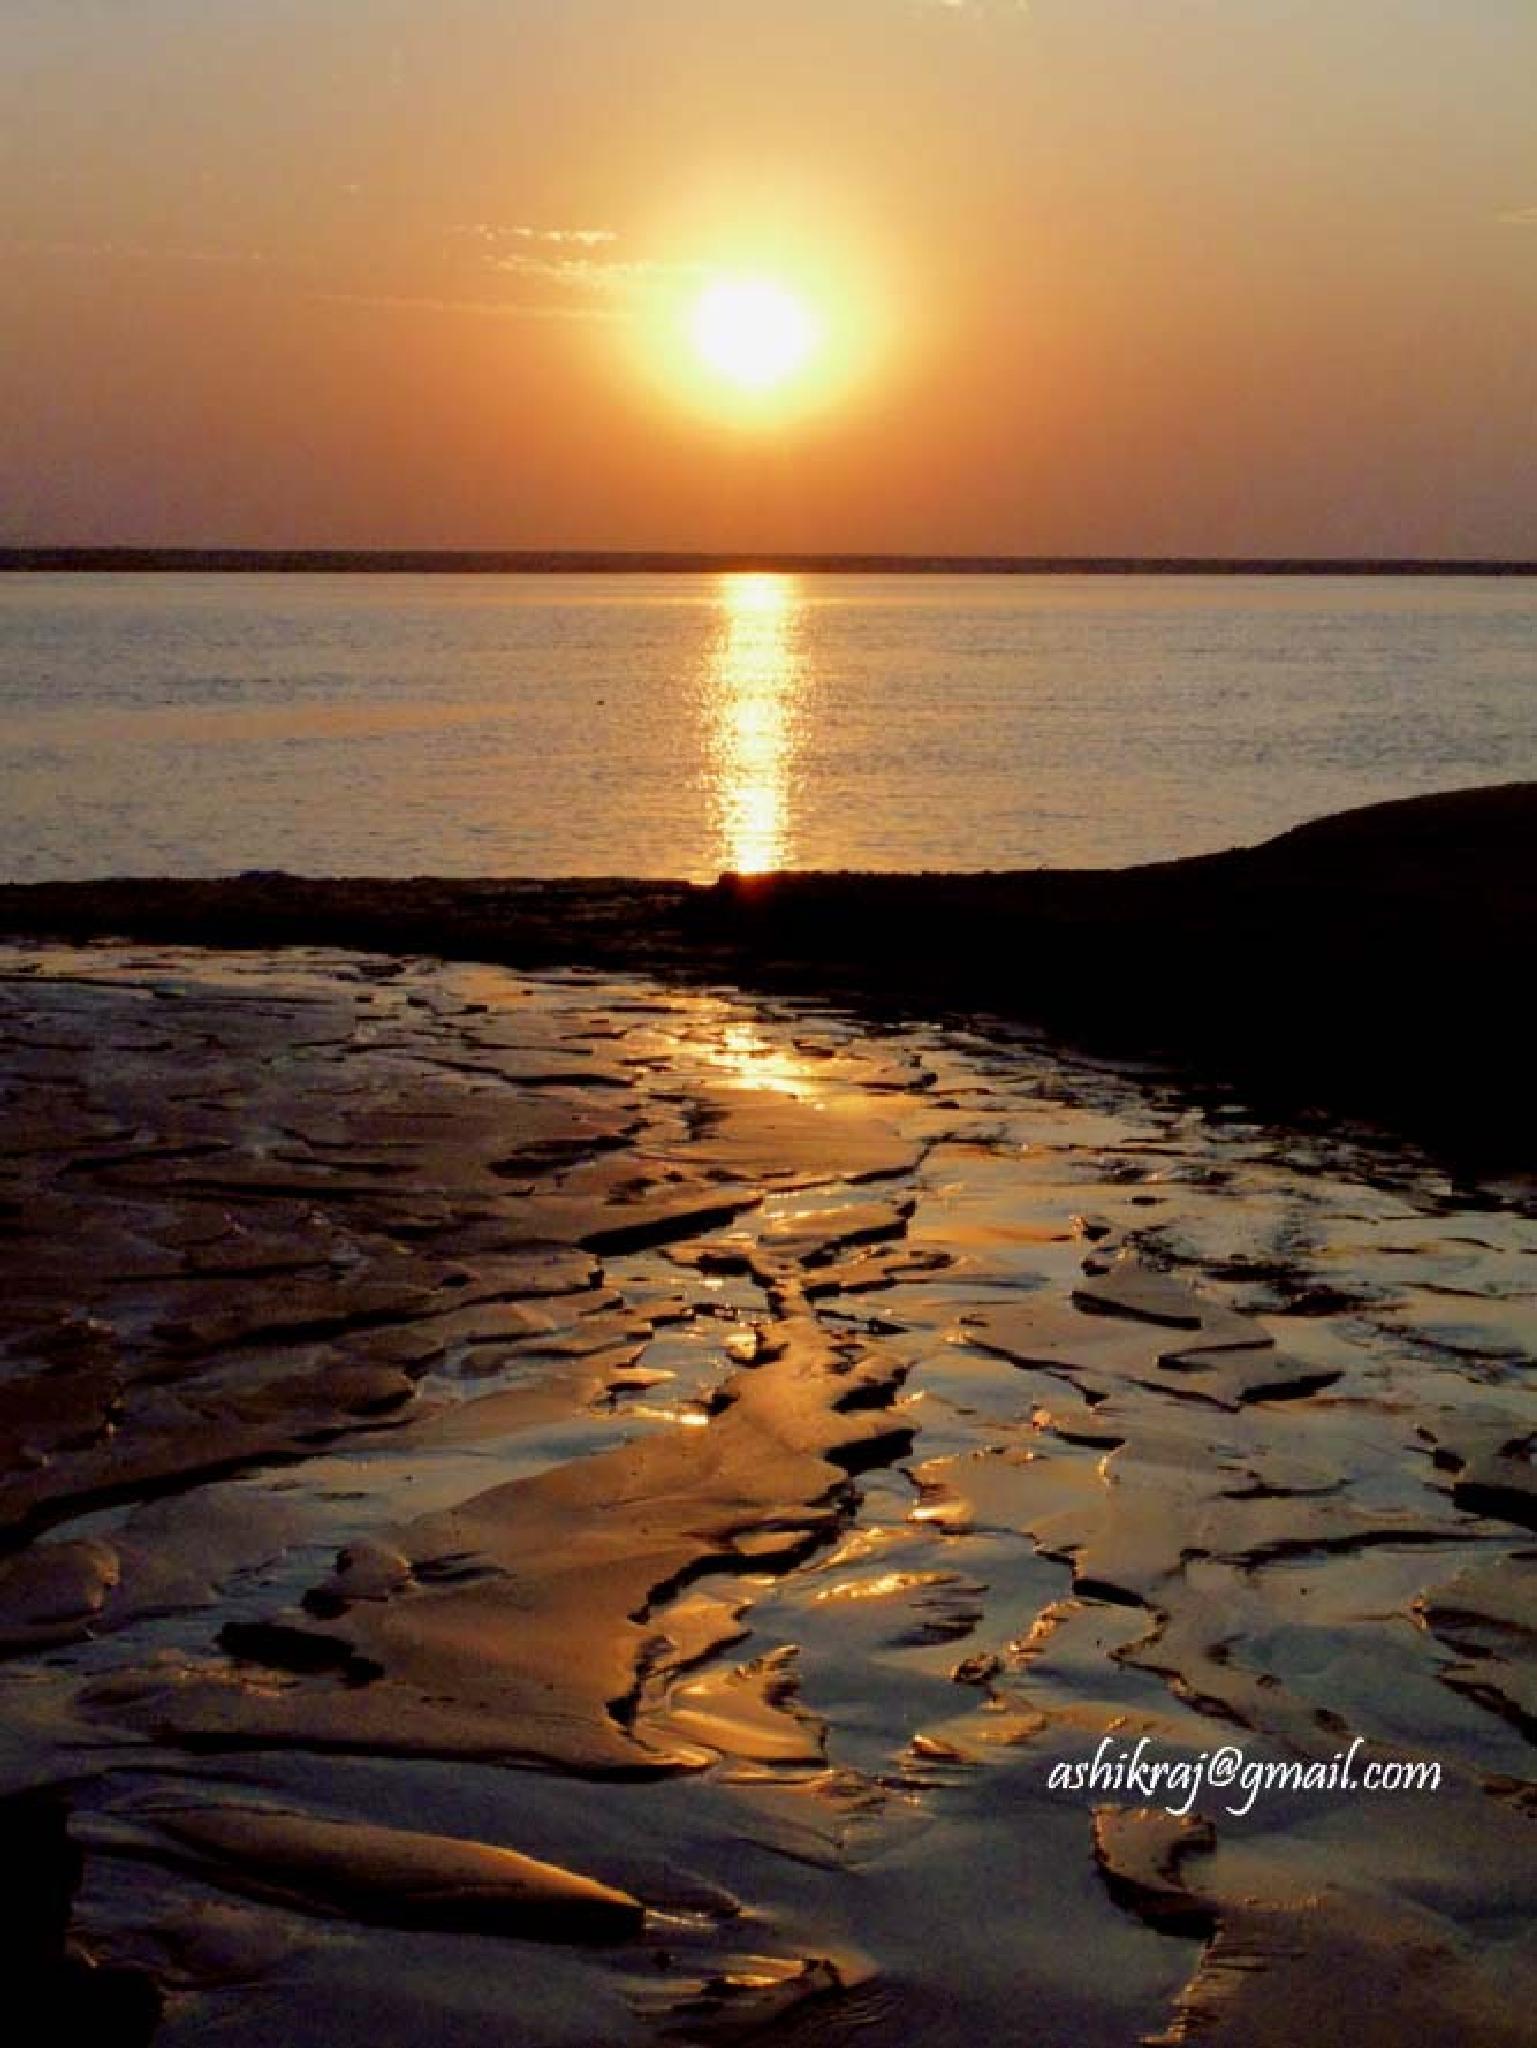 Reflection on Sand by Ashik Iqbal